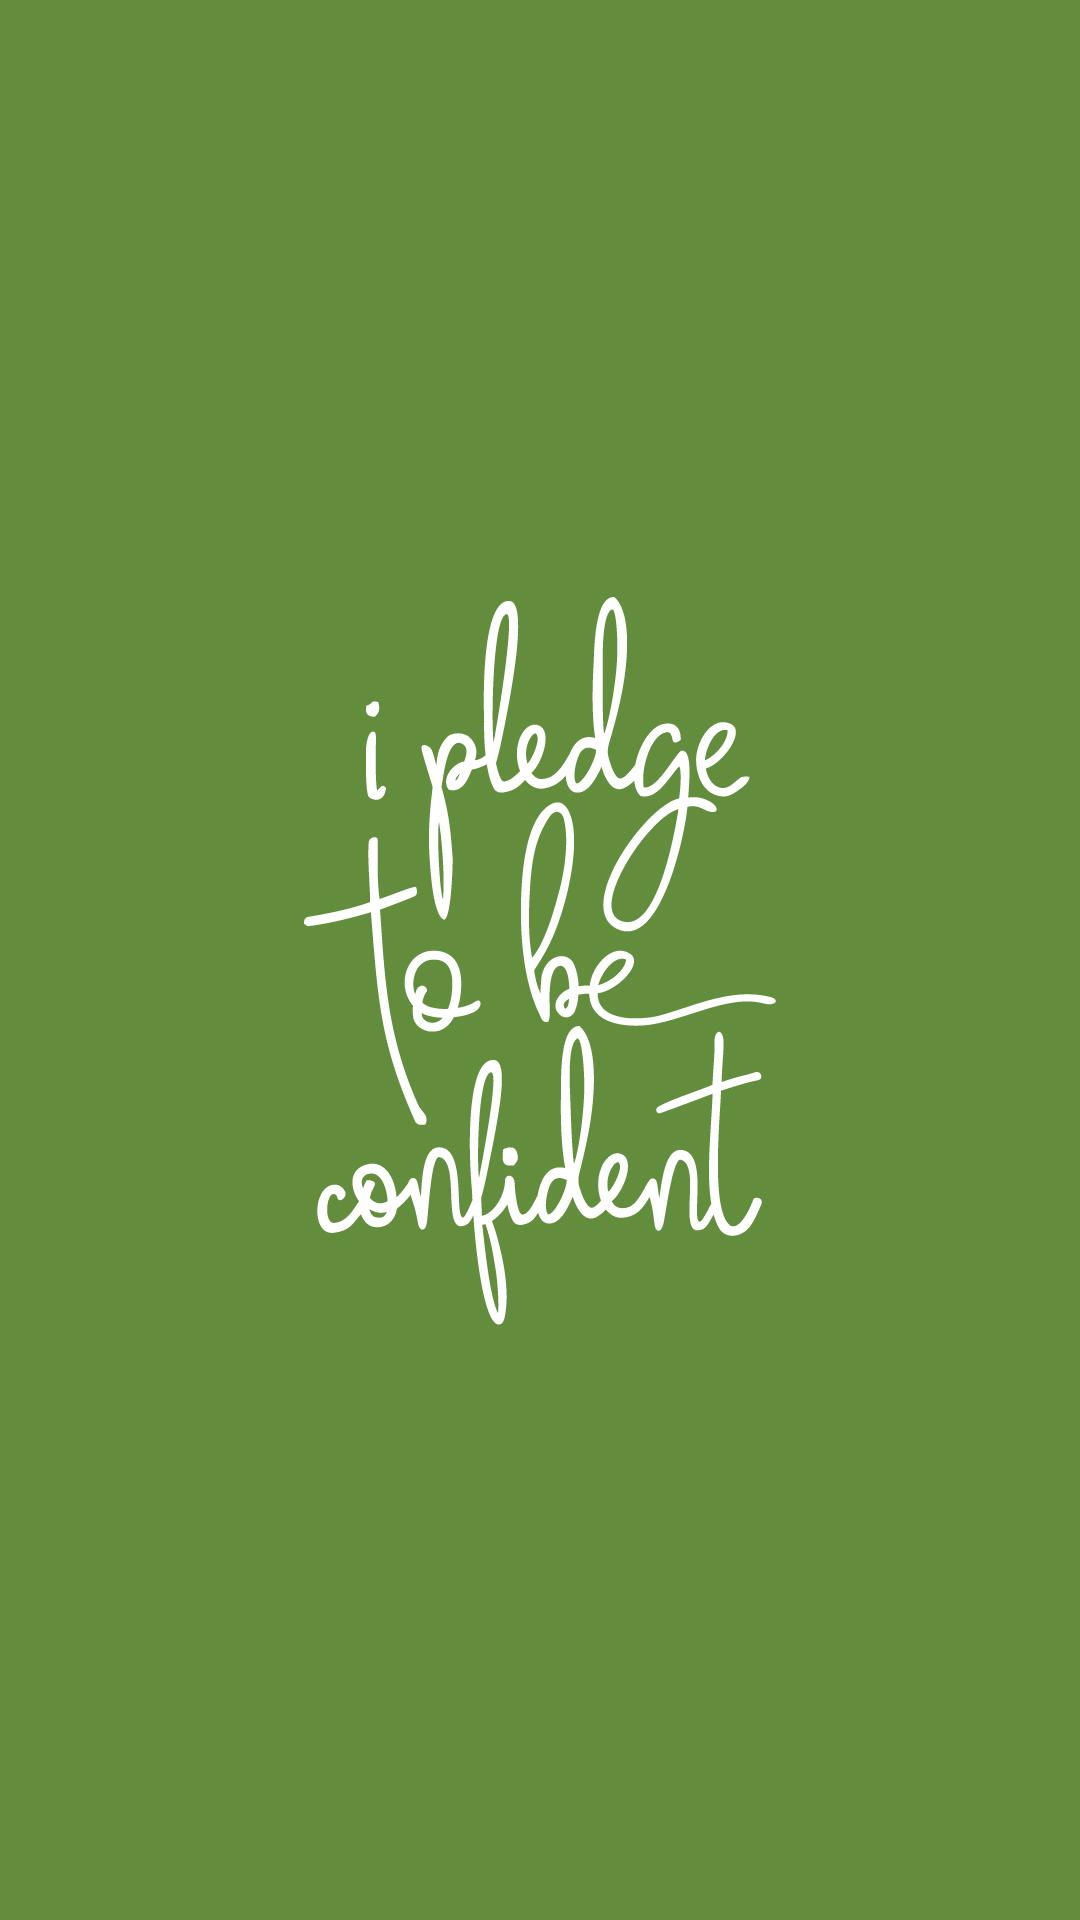 I pledge to be confident Kappa Delta Instagram Story background 1080x1920